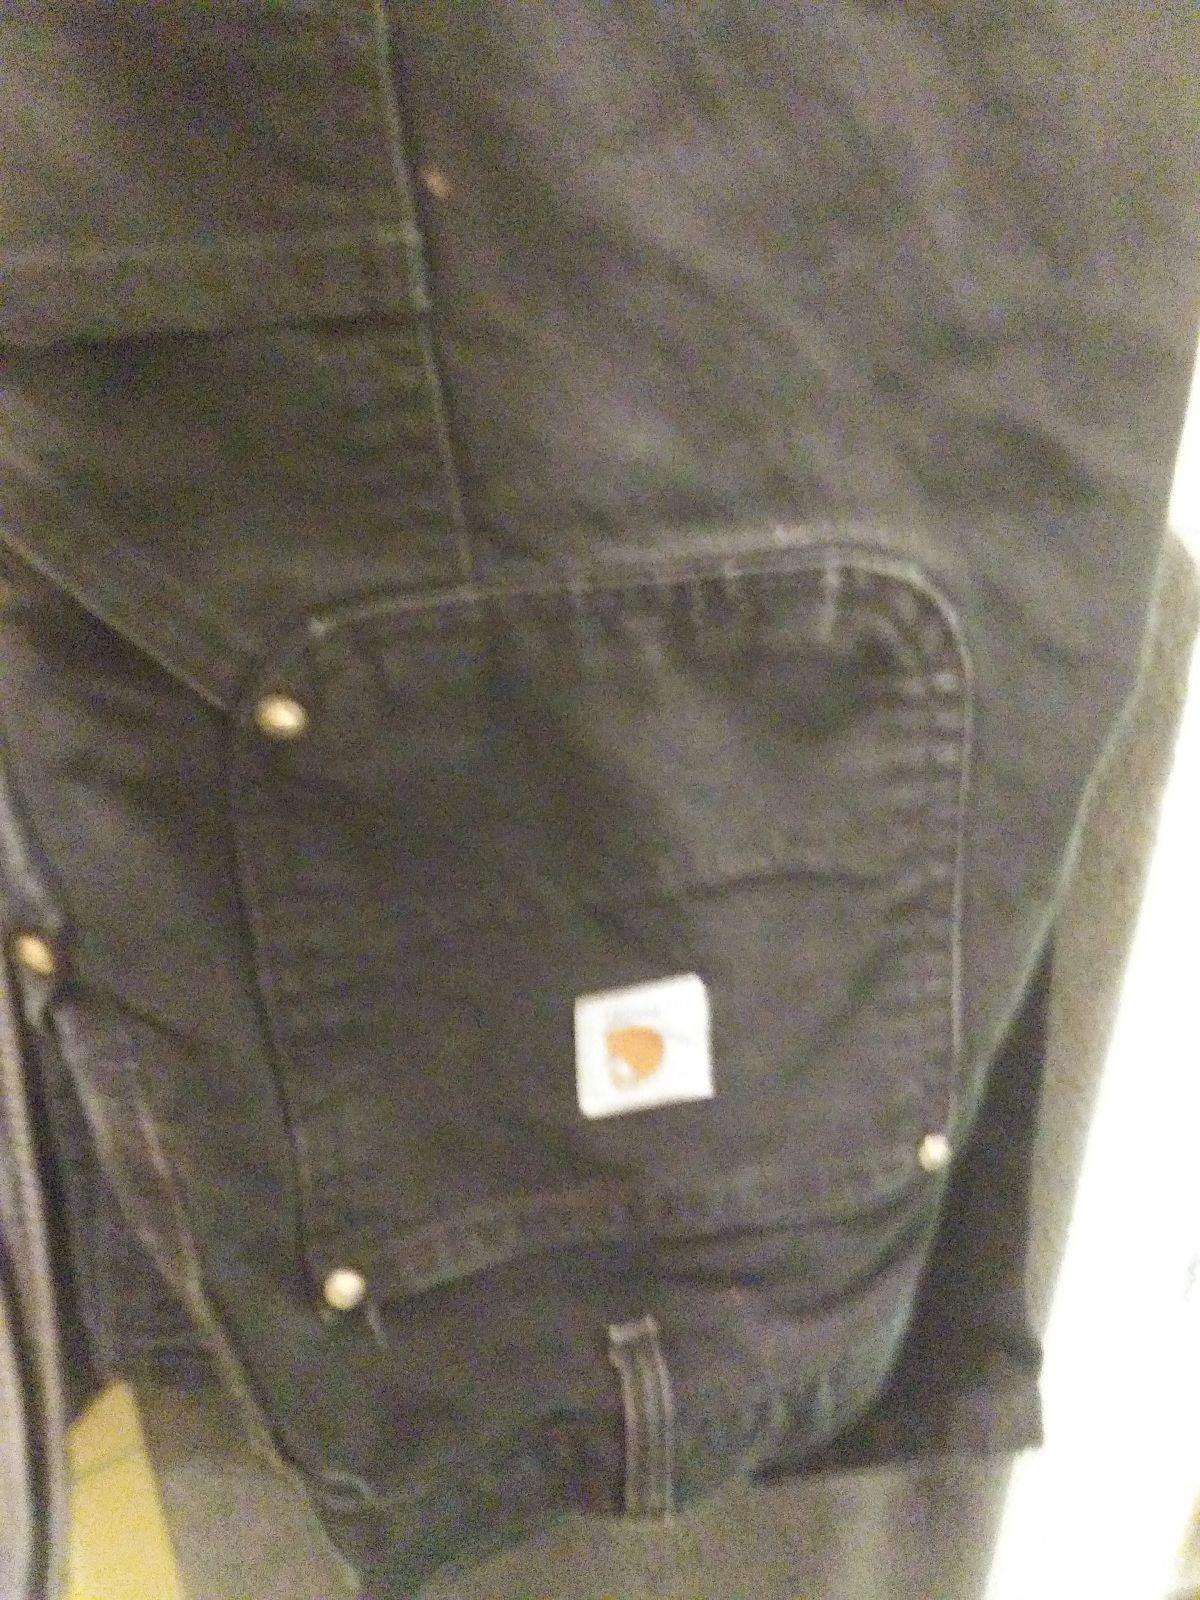 Carhartt original fit carpenter pants